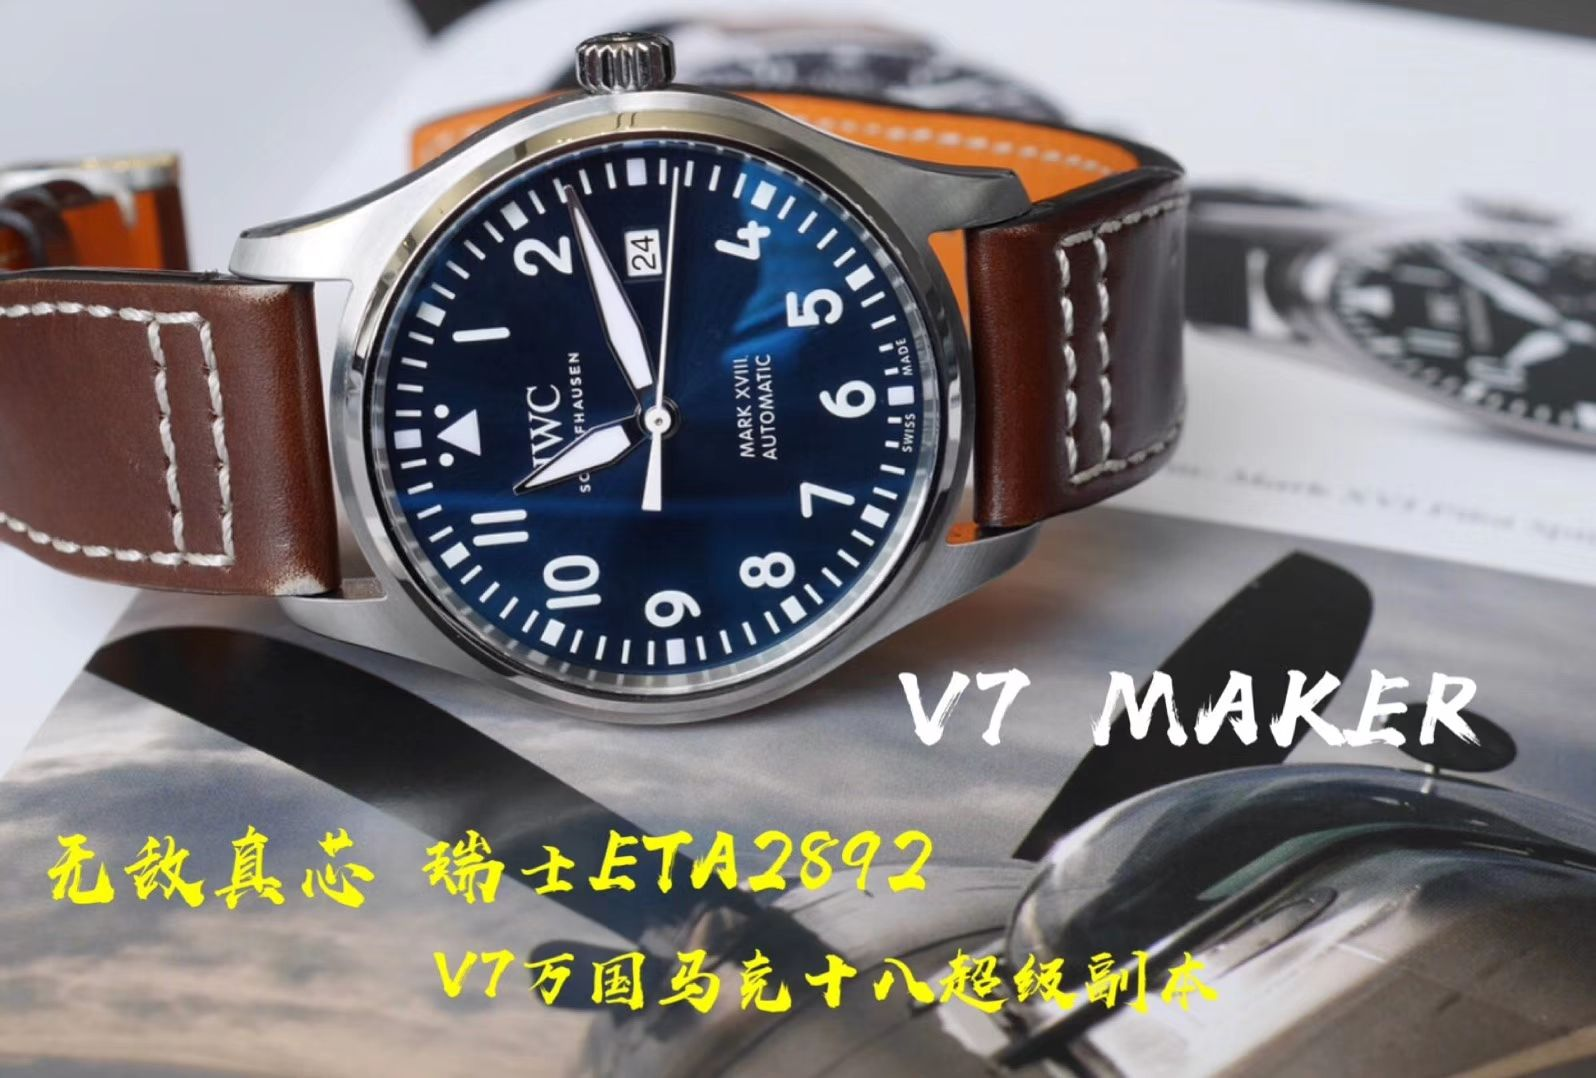 "【V7顶级高端作品、一比一超A高仿】万国表 马克十八飞行员腕表""小王子""特别版系列IW327004腕表、IW327003,IW327001,IW327002 / WG168"